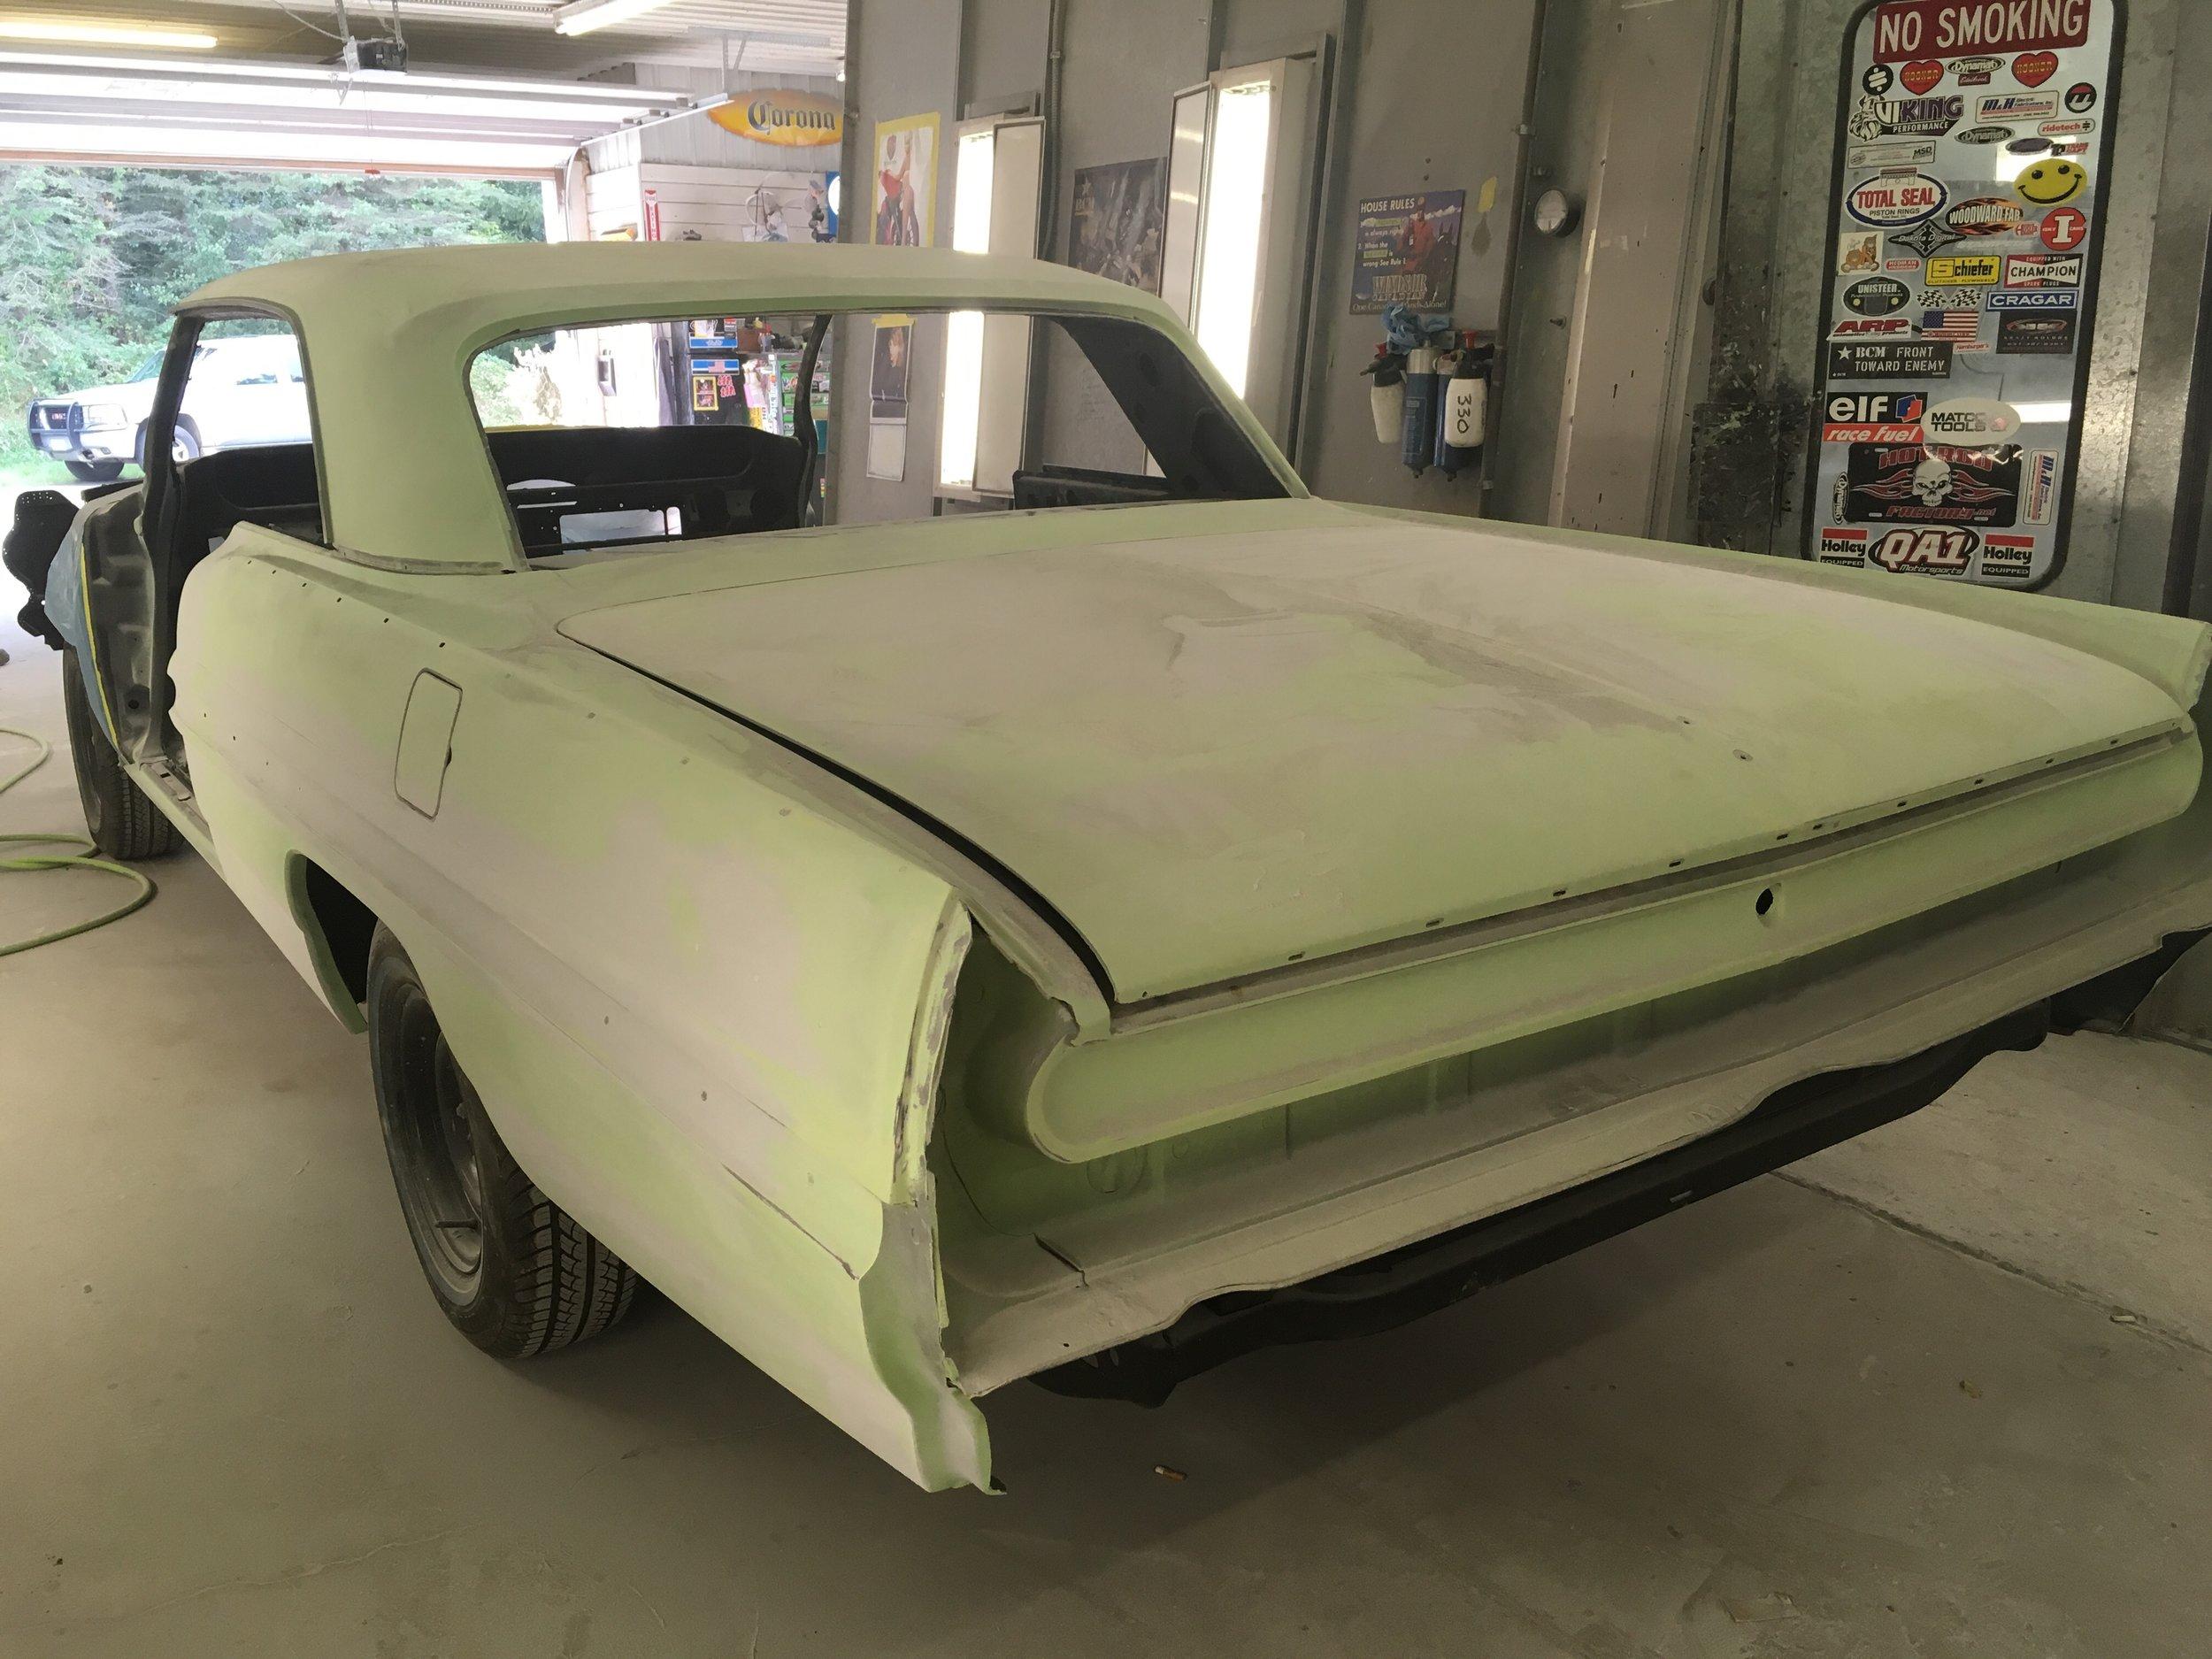 1962-Pontiac-Bonneville-minneapolis-hot-rod-custom-build-restoration-10.jpg